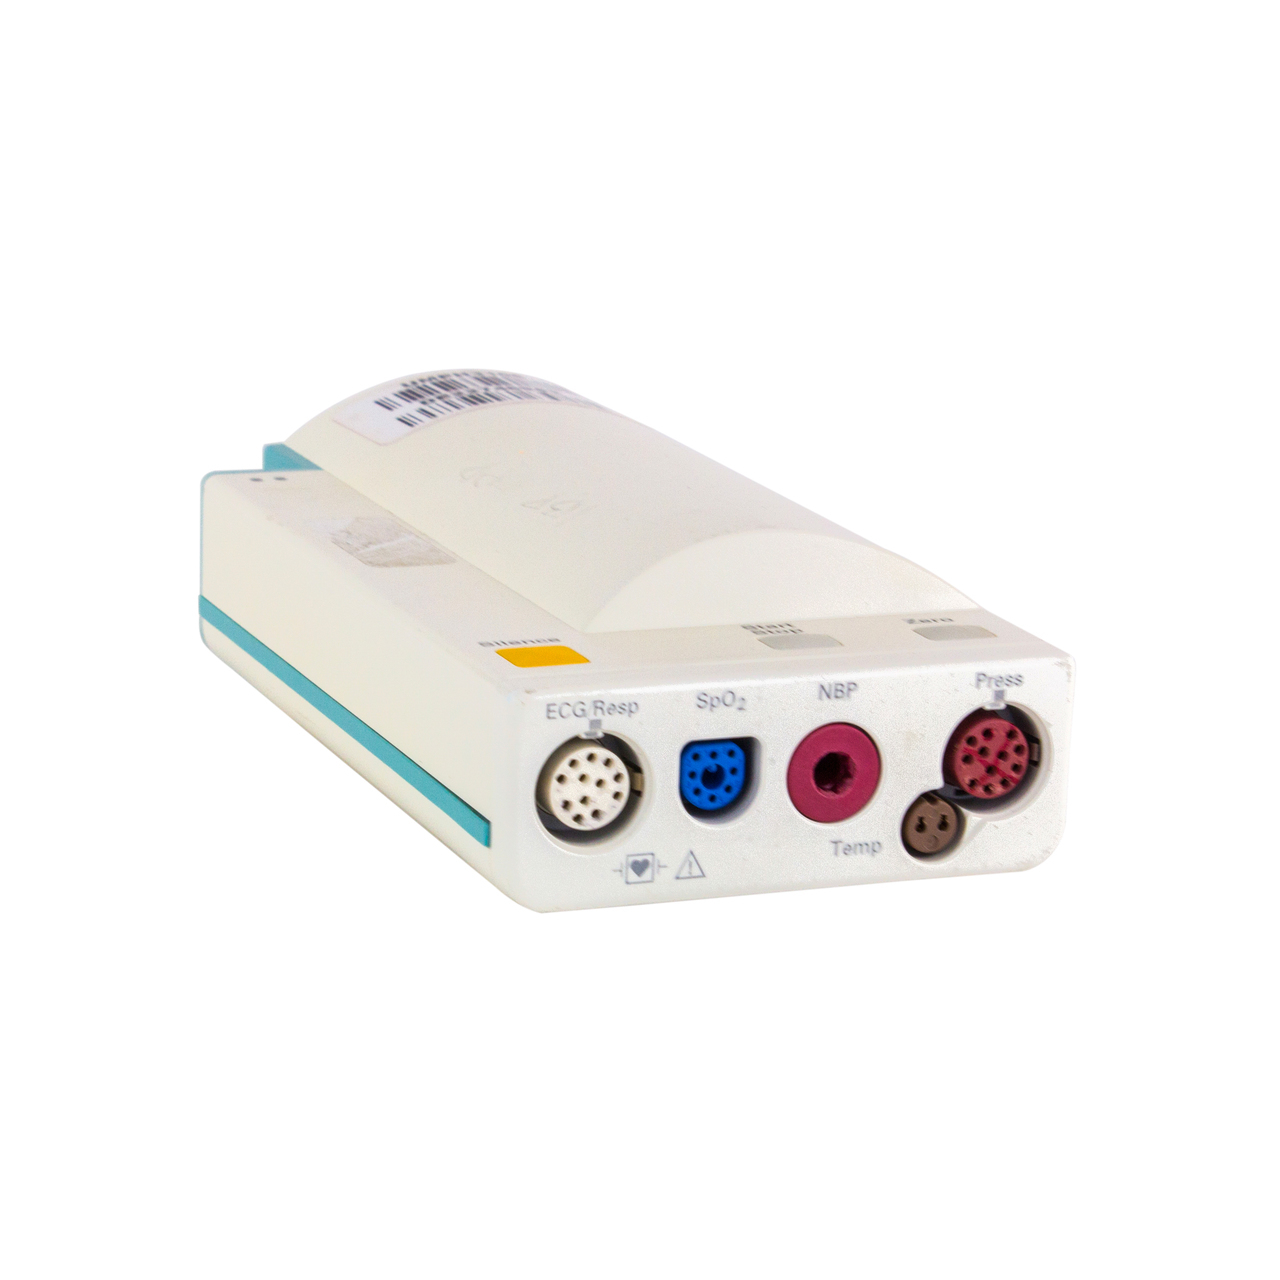 Philips Intellivue Module M3001A - A01C06 - Fast SPO2, NIBP, ECG, Temp, IBP